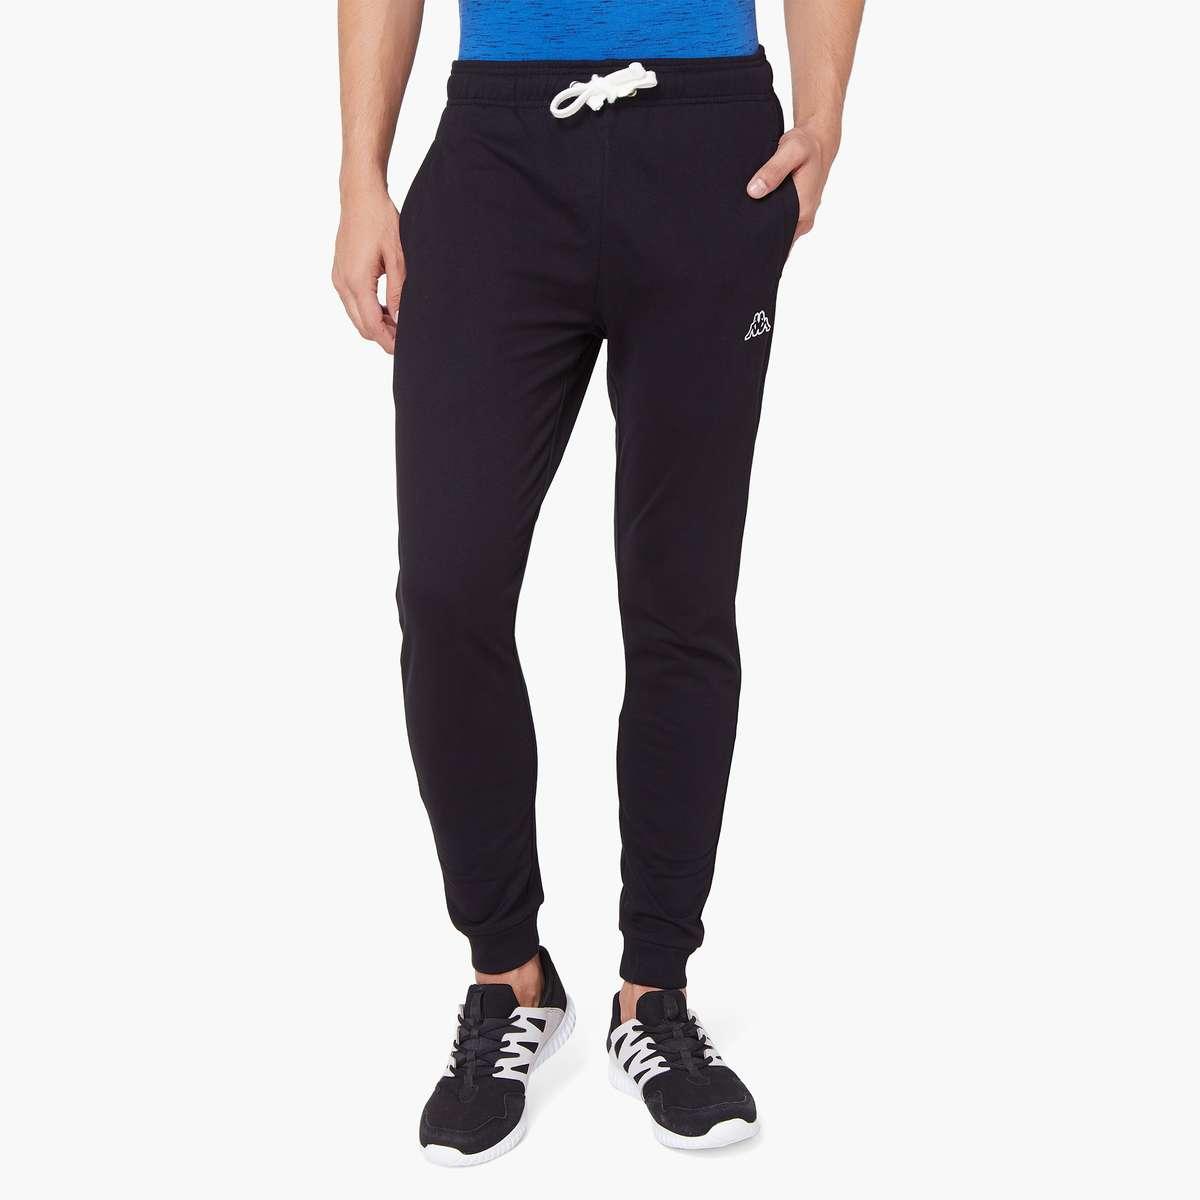 5.KAPPA Solid Jogger Trackpants